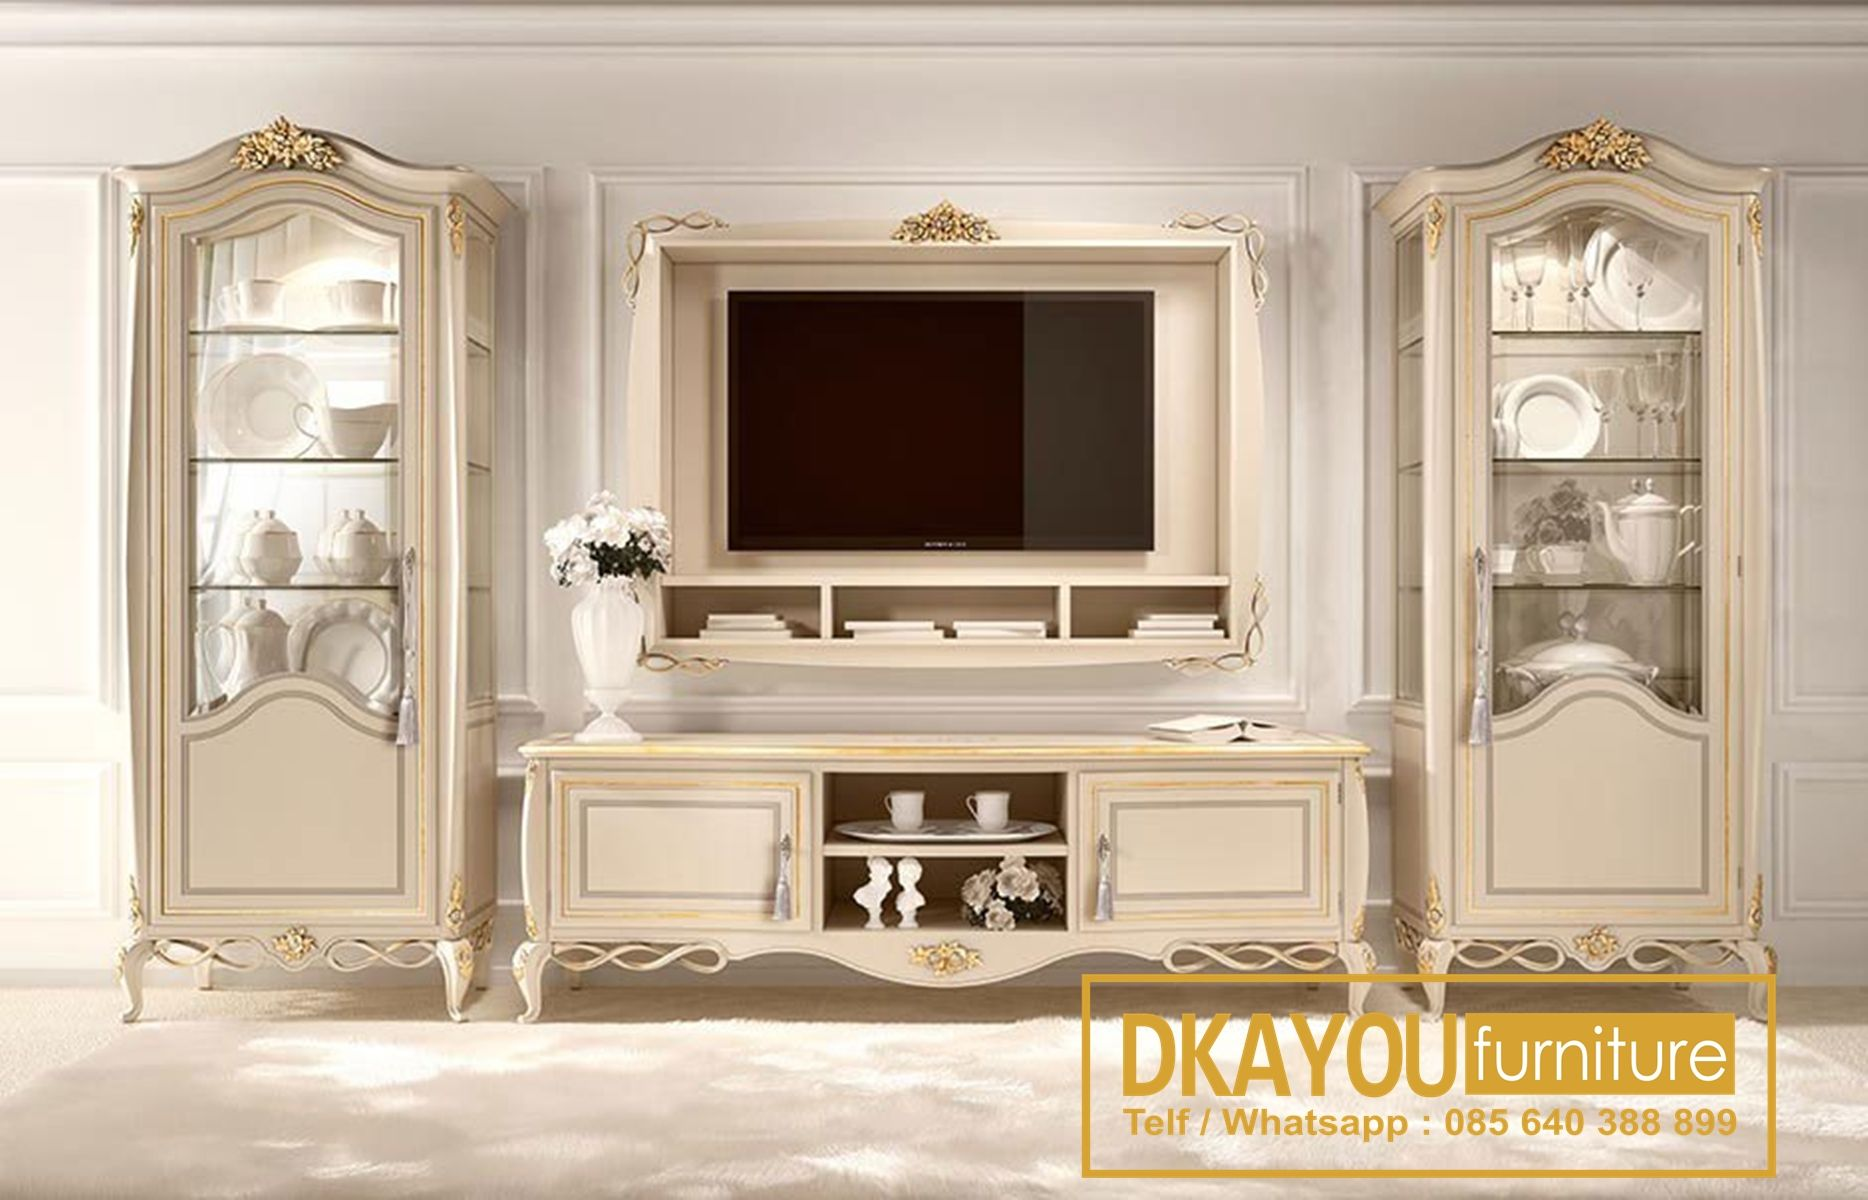 Set Bufet Tv Klasik Mewah Eropa Terbaru Cabinet Tv Klasik Jepara Btv 131 Df Dkayou Furniture Indonesia Furniture Classic Furniture Living Room Tv Stand #tv #units #for #living #room